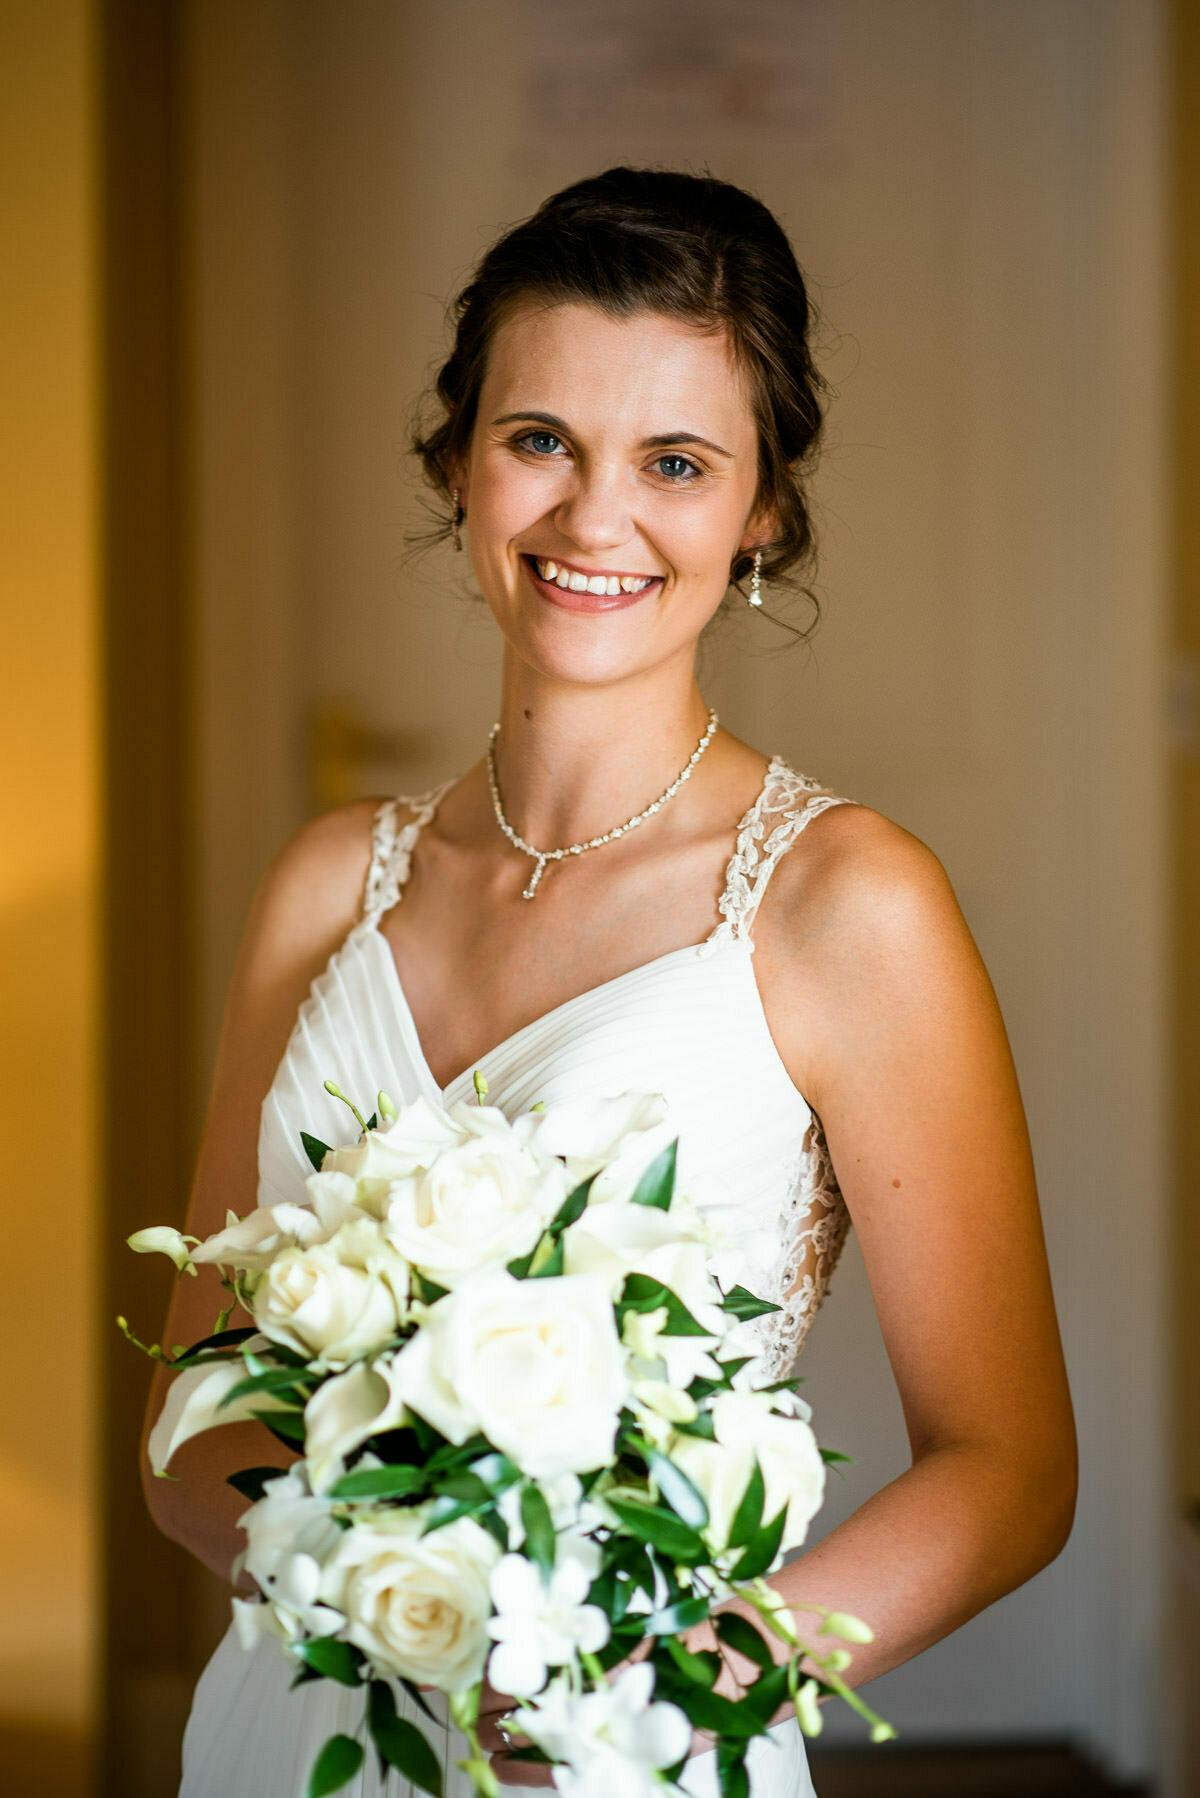 Wedding morning Delbury Hall, wedding flowers